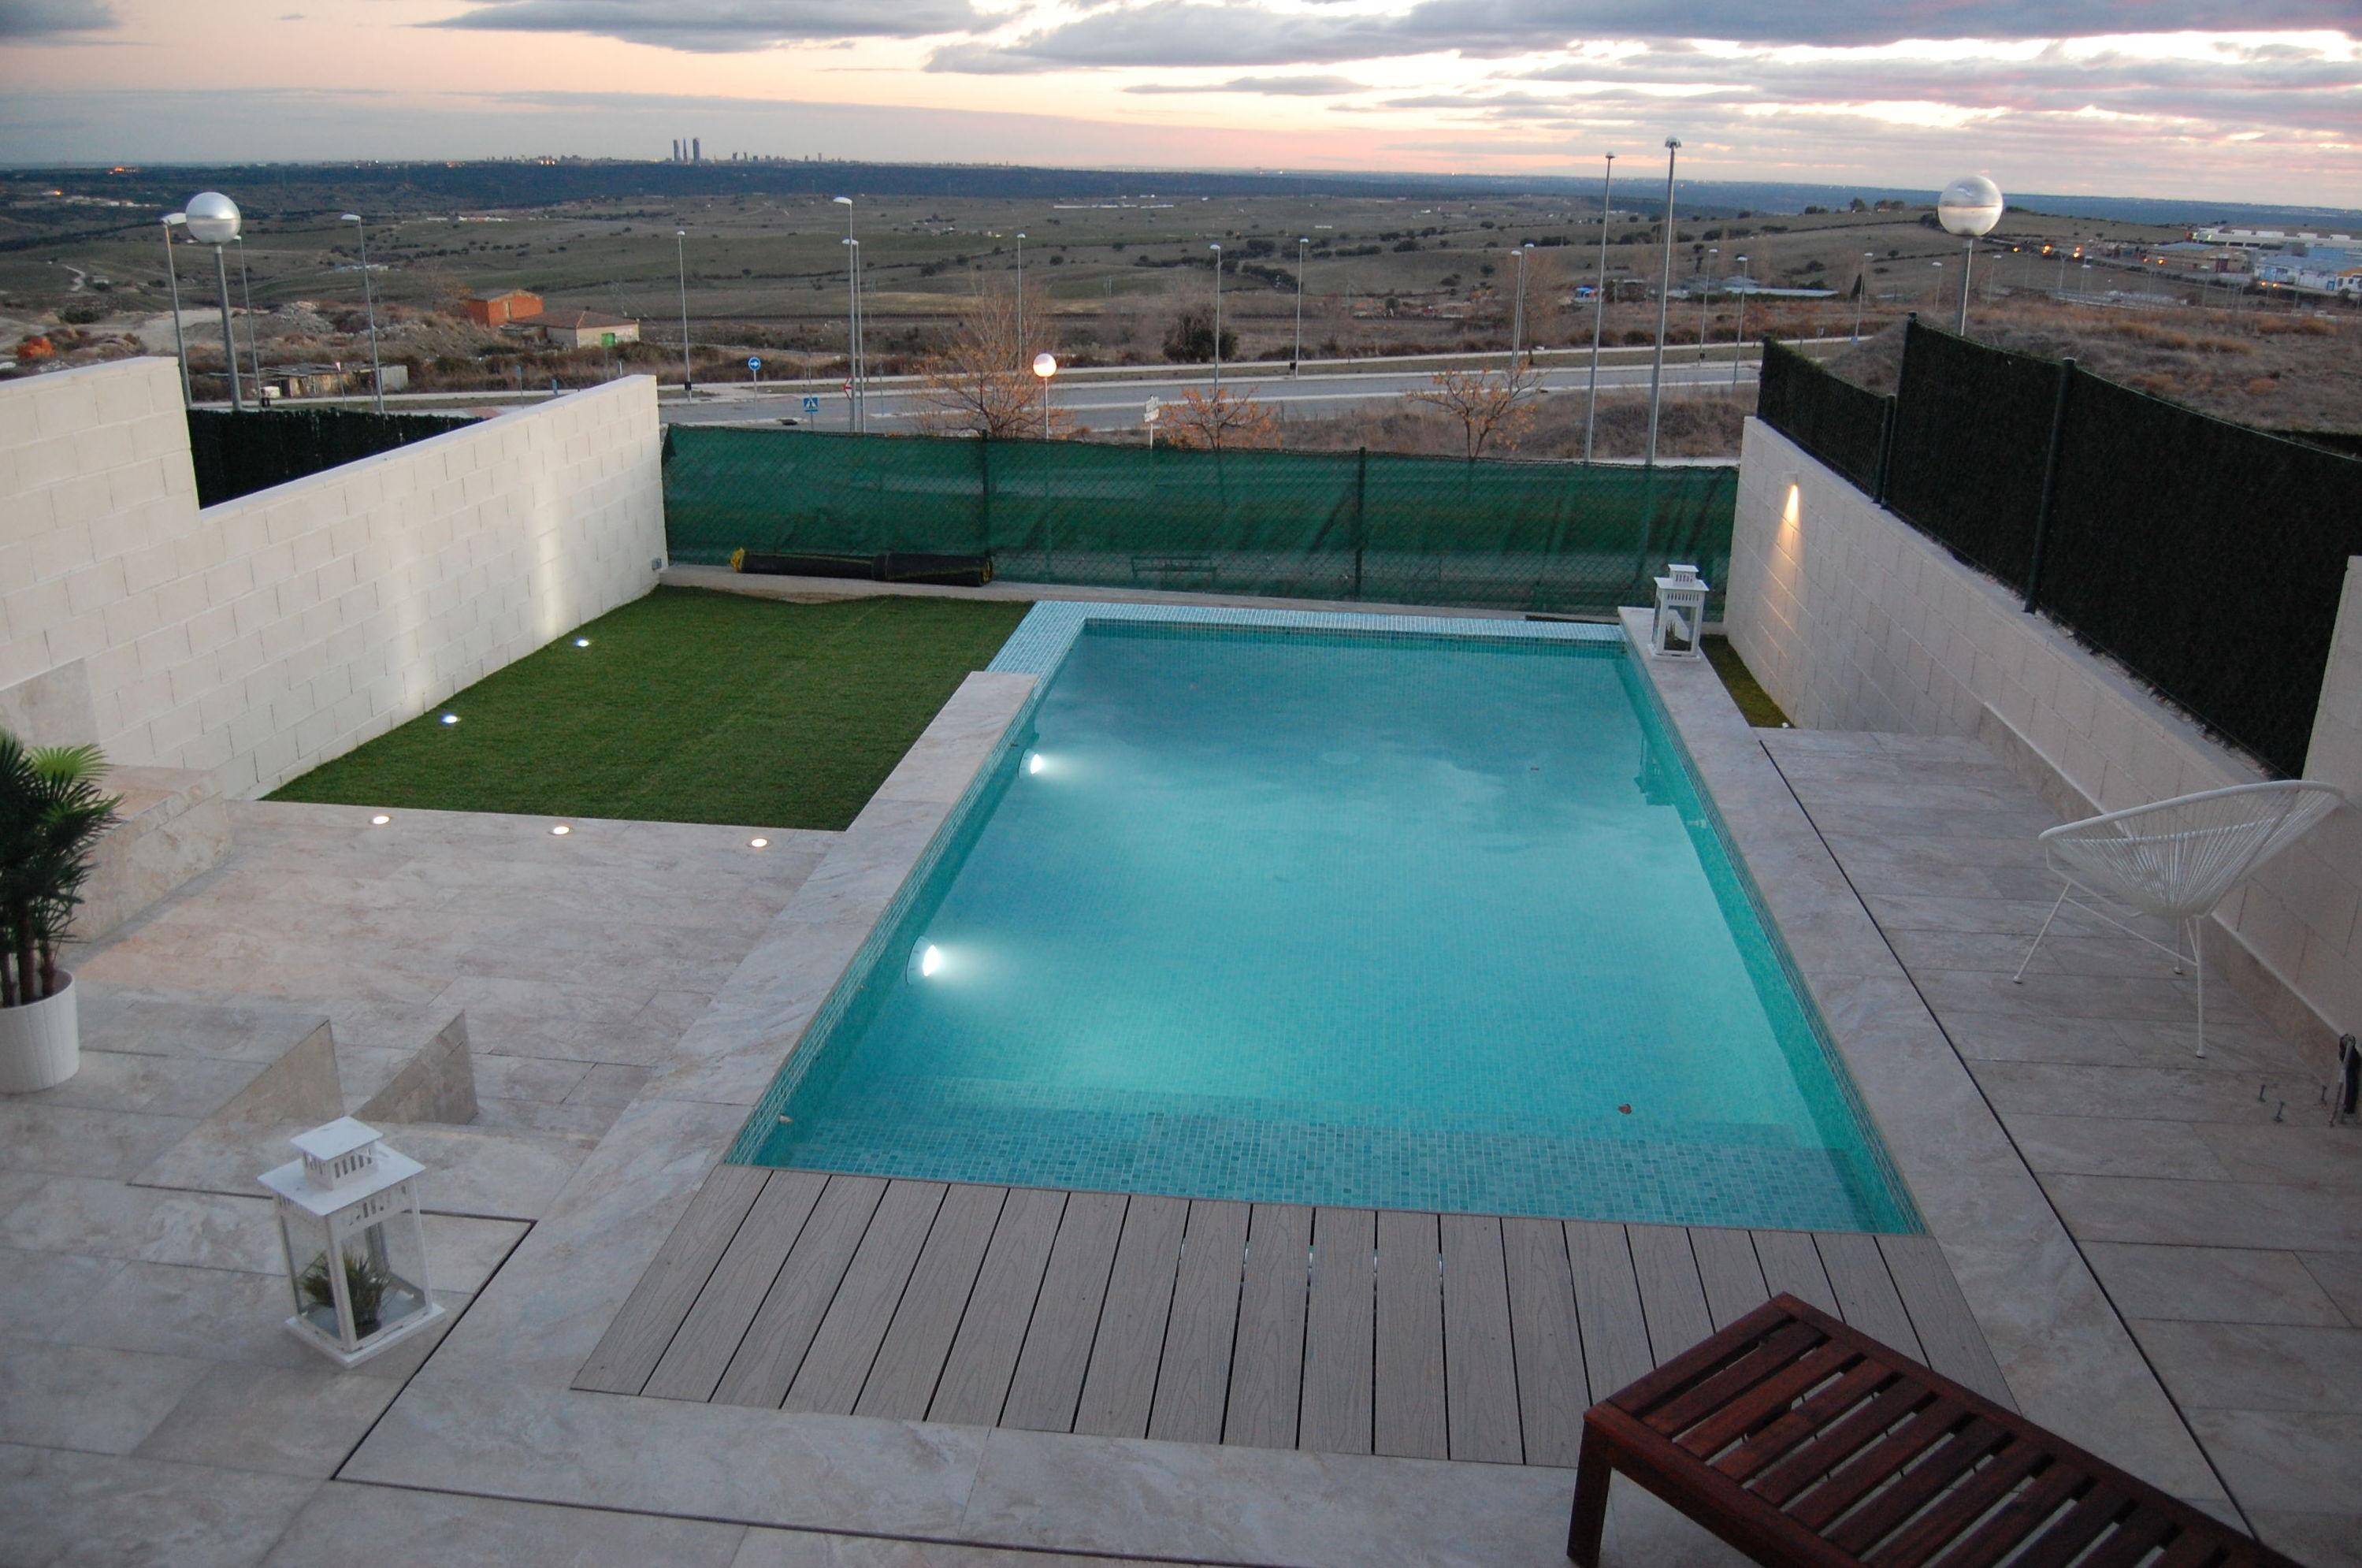 https://www.piscinas-jardines-algete.com/es/fotos/img/7337461/